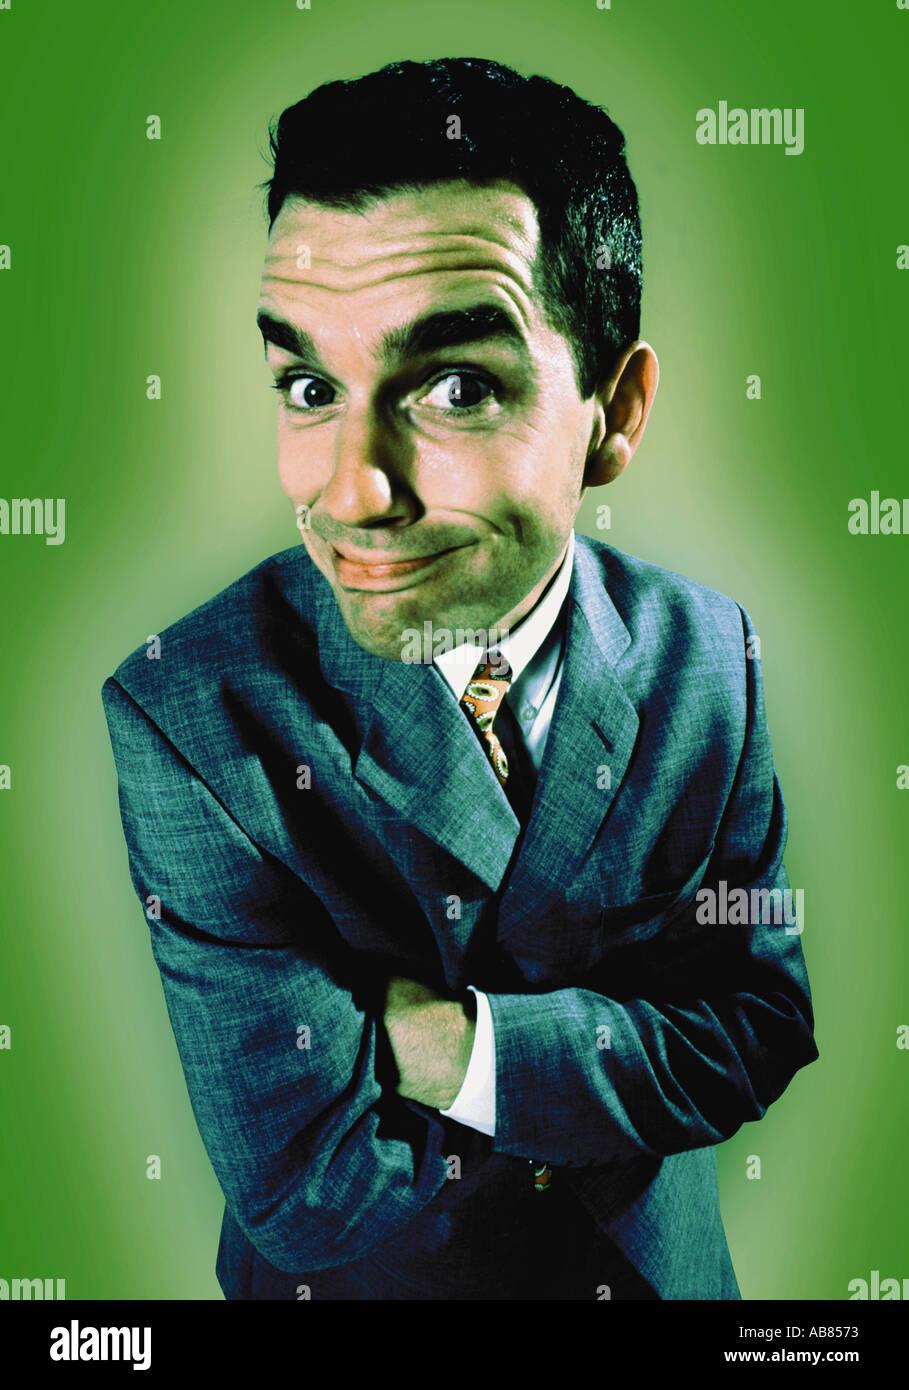 Content businessman Photo Stock